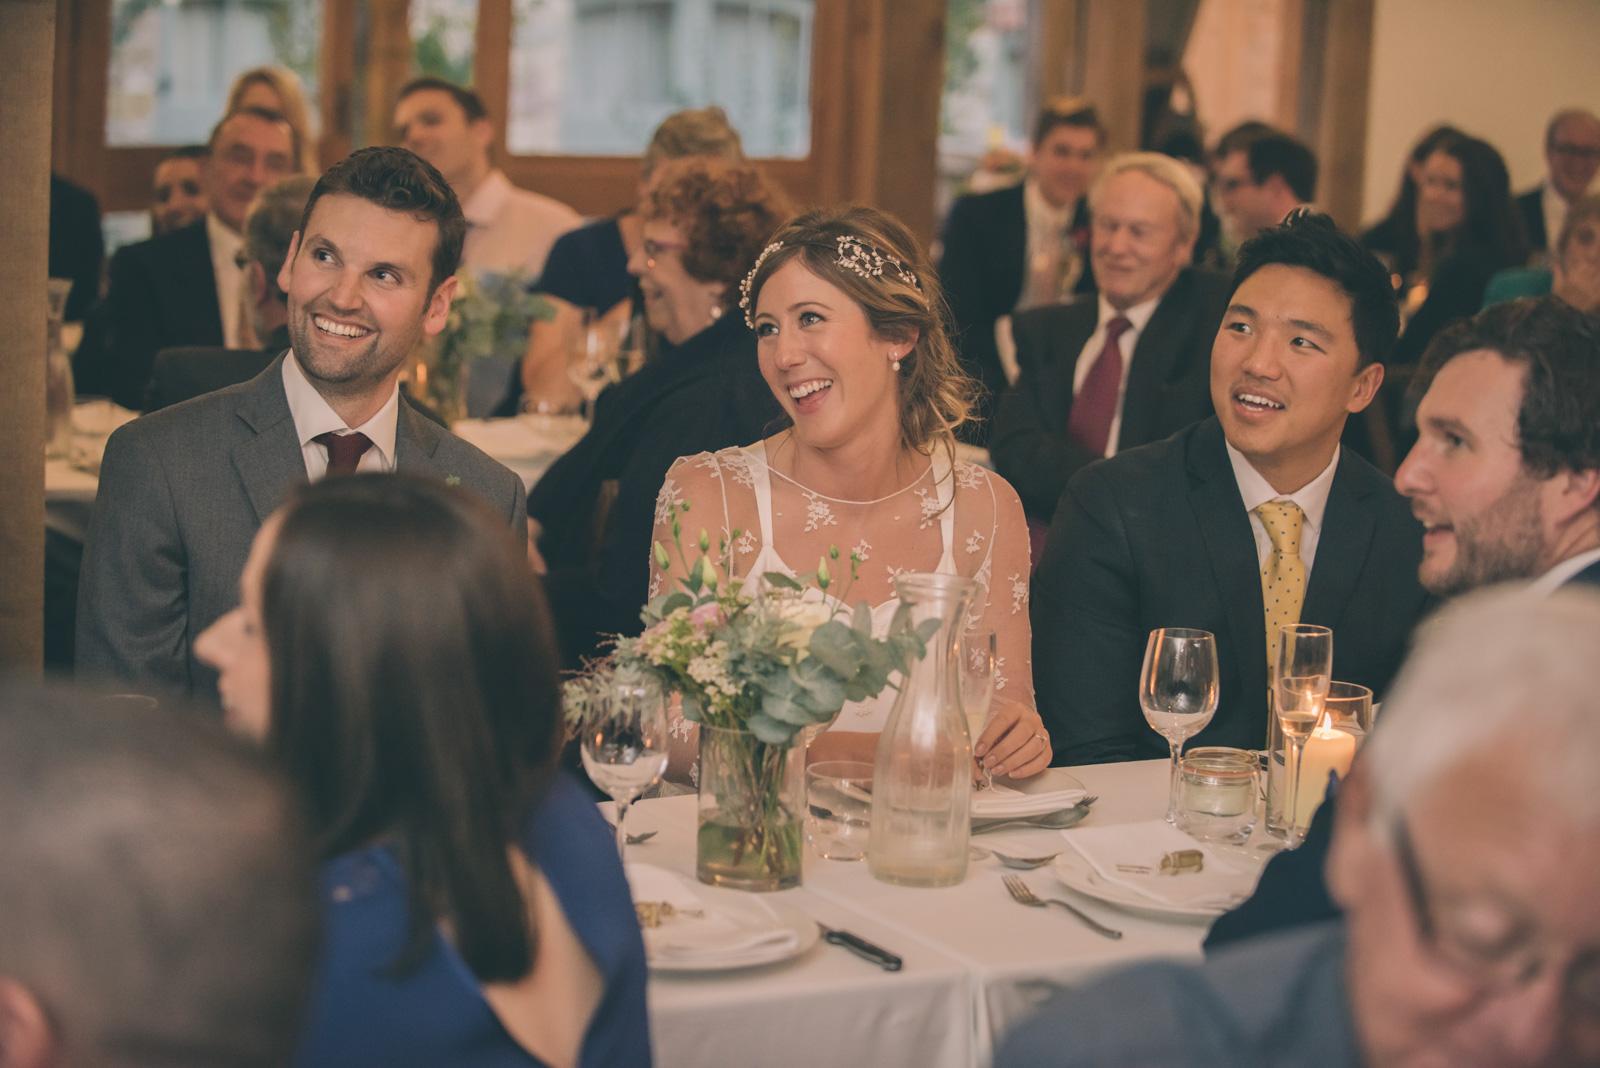 nancarrow-wedding-photography-144.jpg